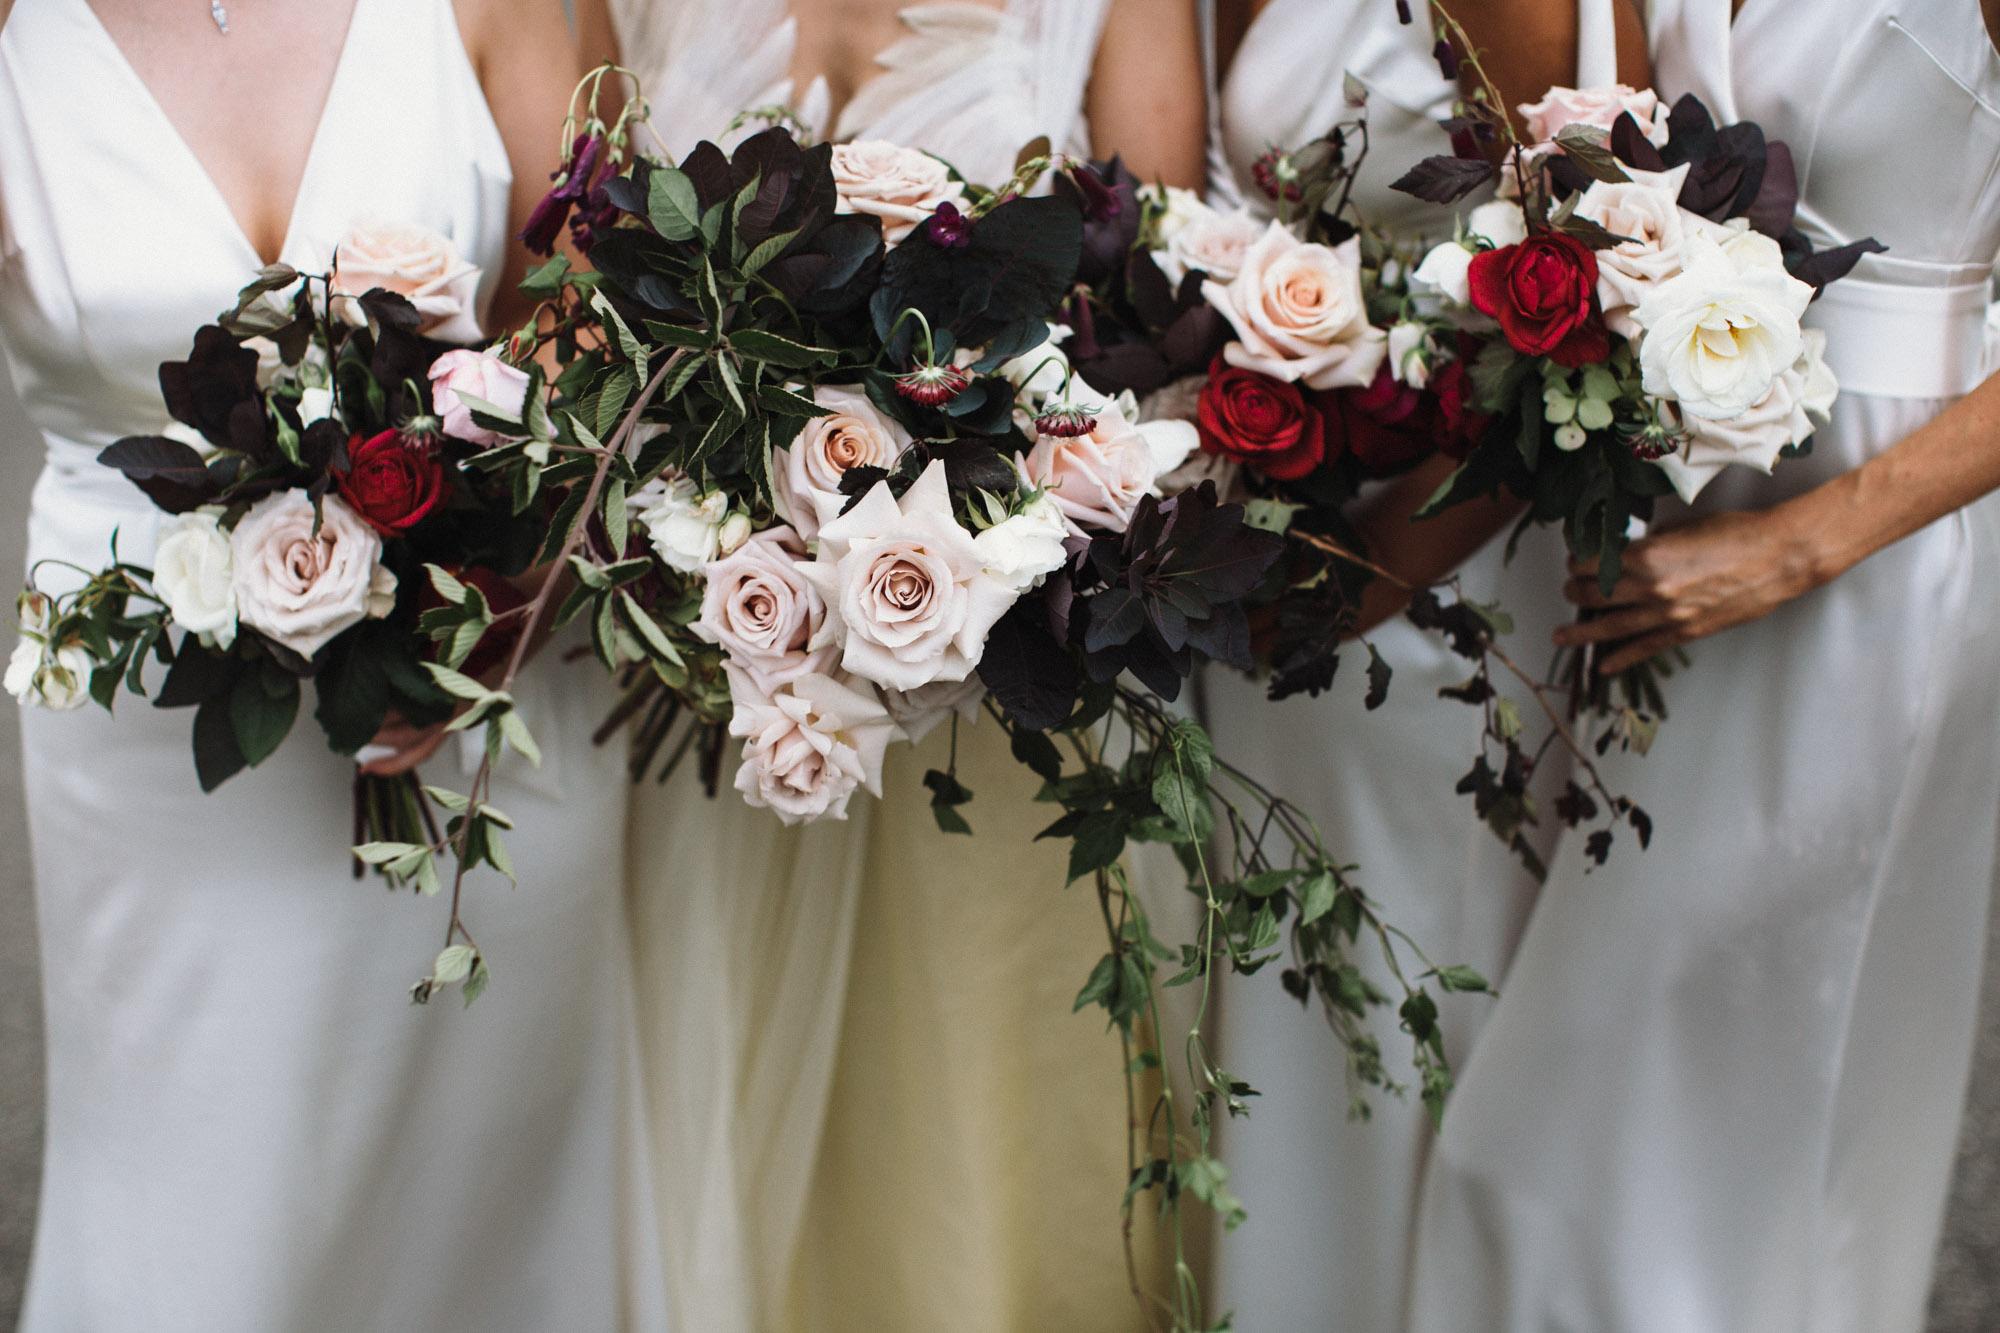 Campbell Point House Wedding HJ + Dean Raphael Weddings-99.jpg